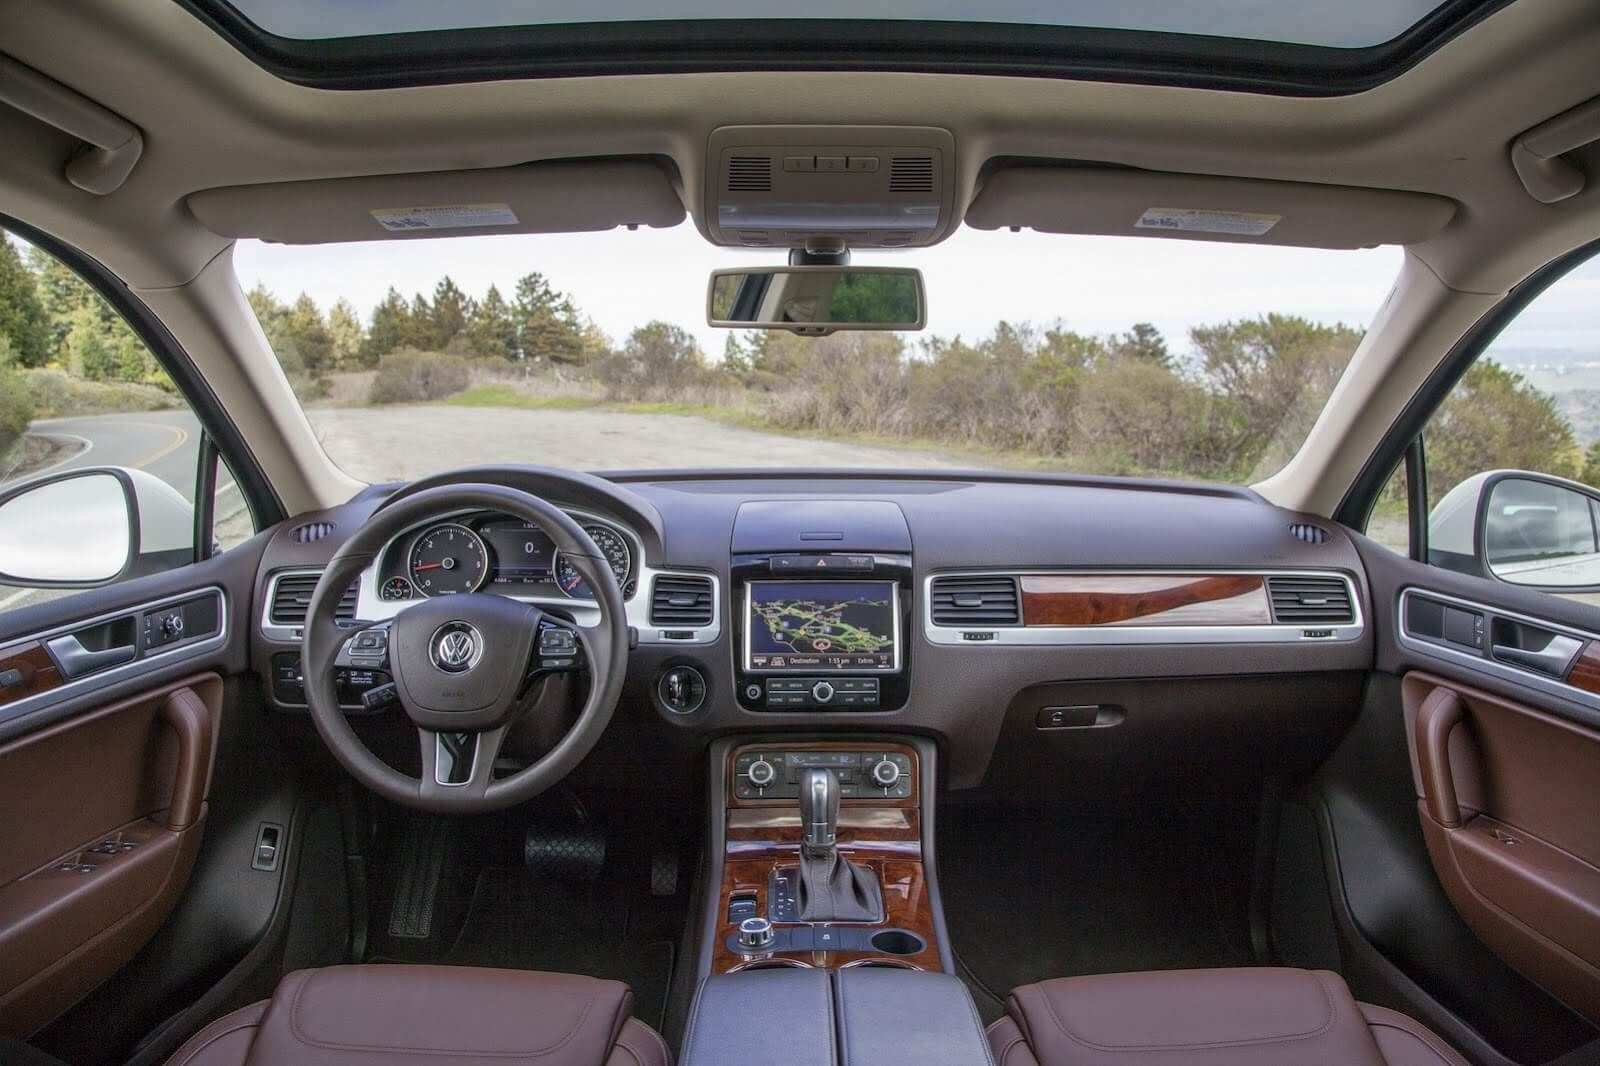 86 Great VW Touareg 2020 Australia Specs and Review with VW Touareg 2020 Australia